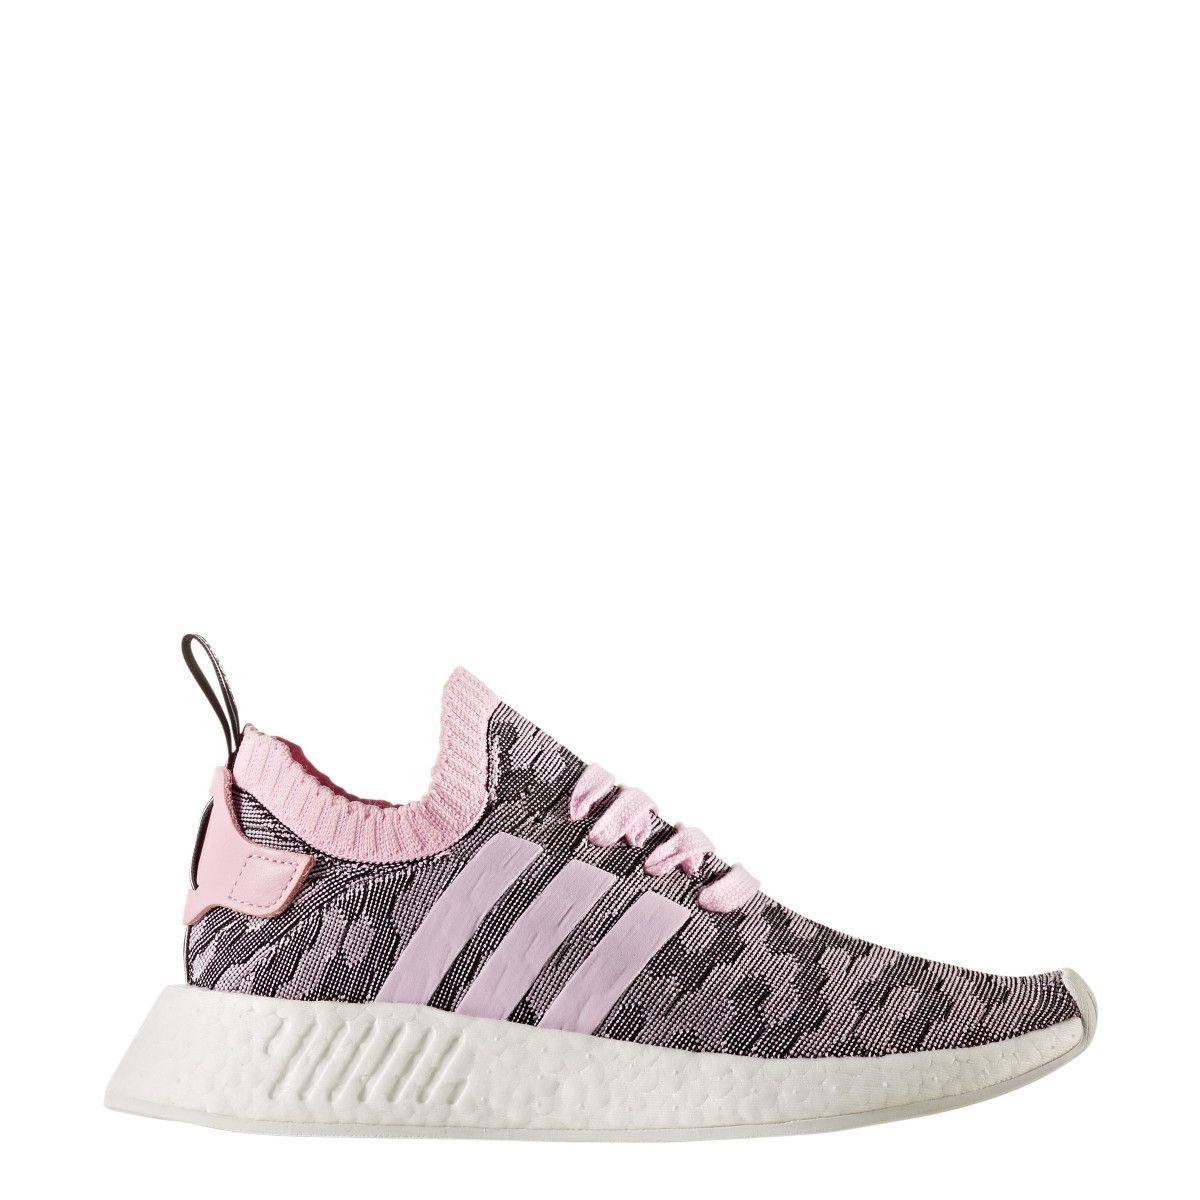 adidas NMD R2 PK - Sneaker Low bei Stylefile